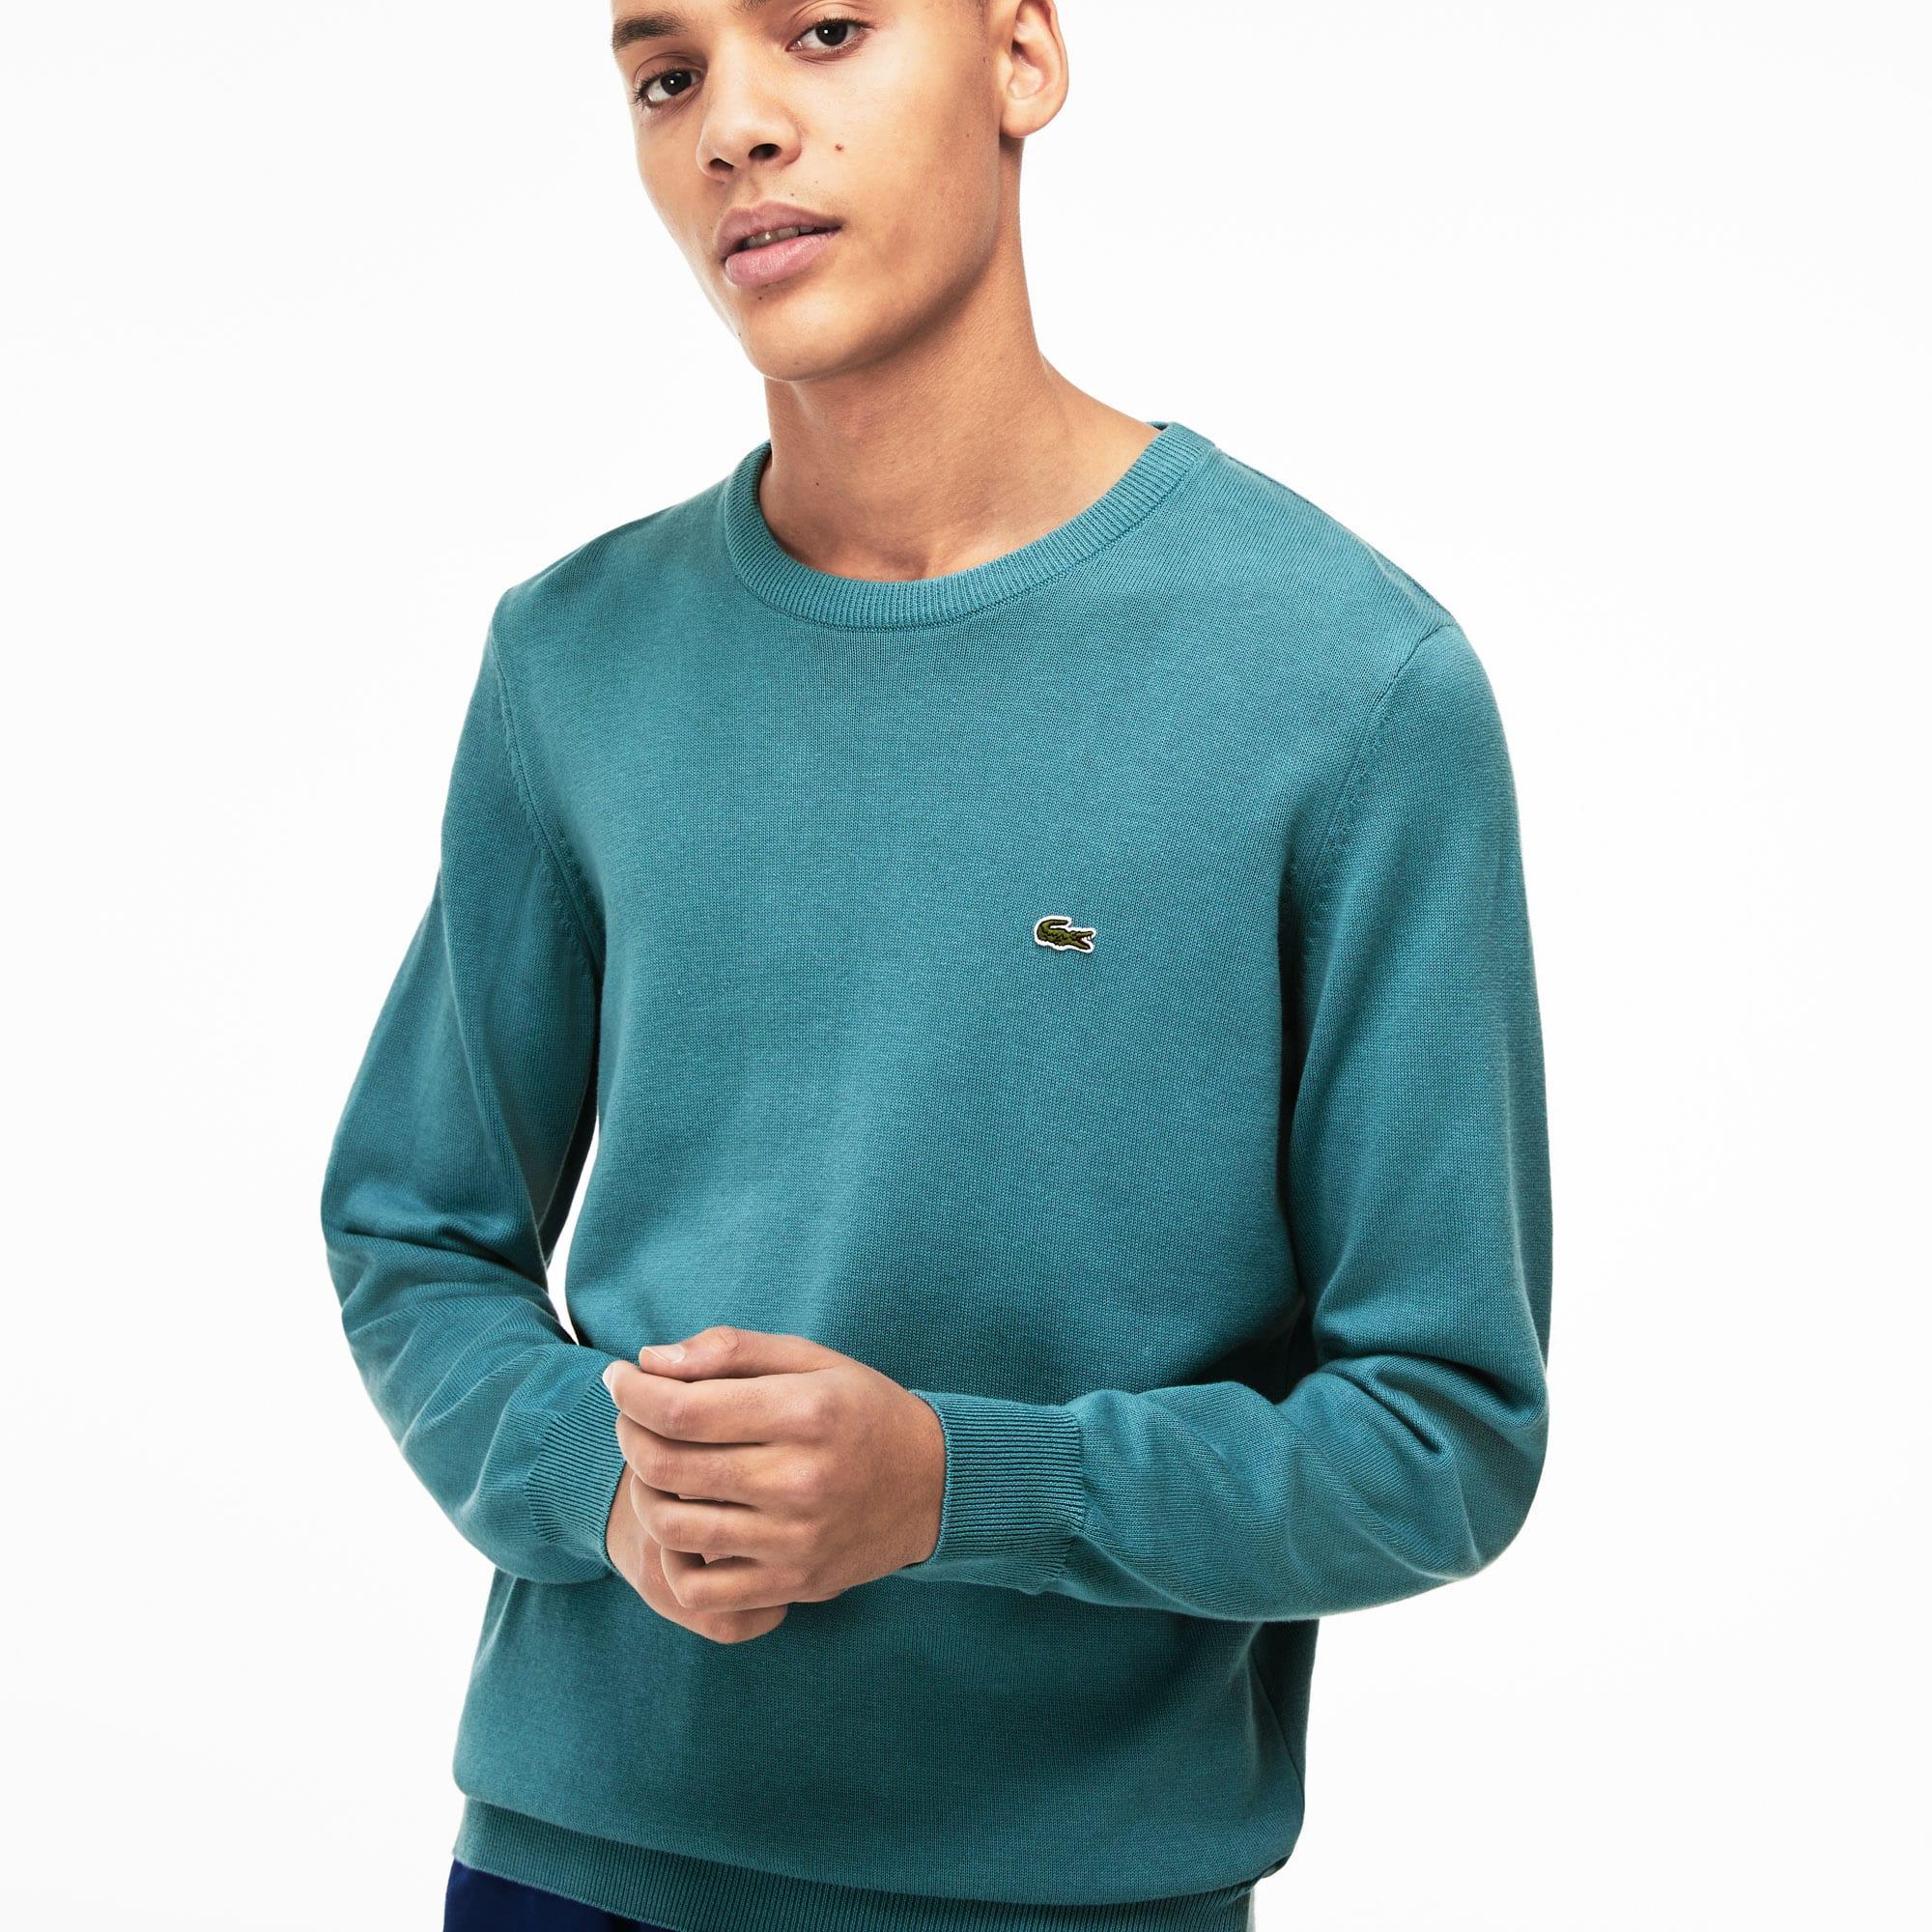 930cb455 Men's Crew Neck Caviar Piqué Accent Cotton Jersey Sweater